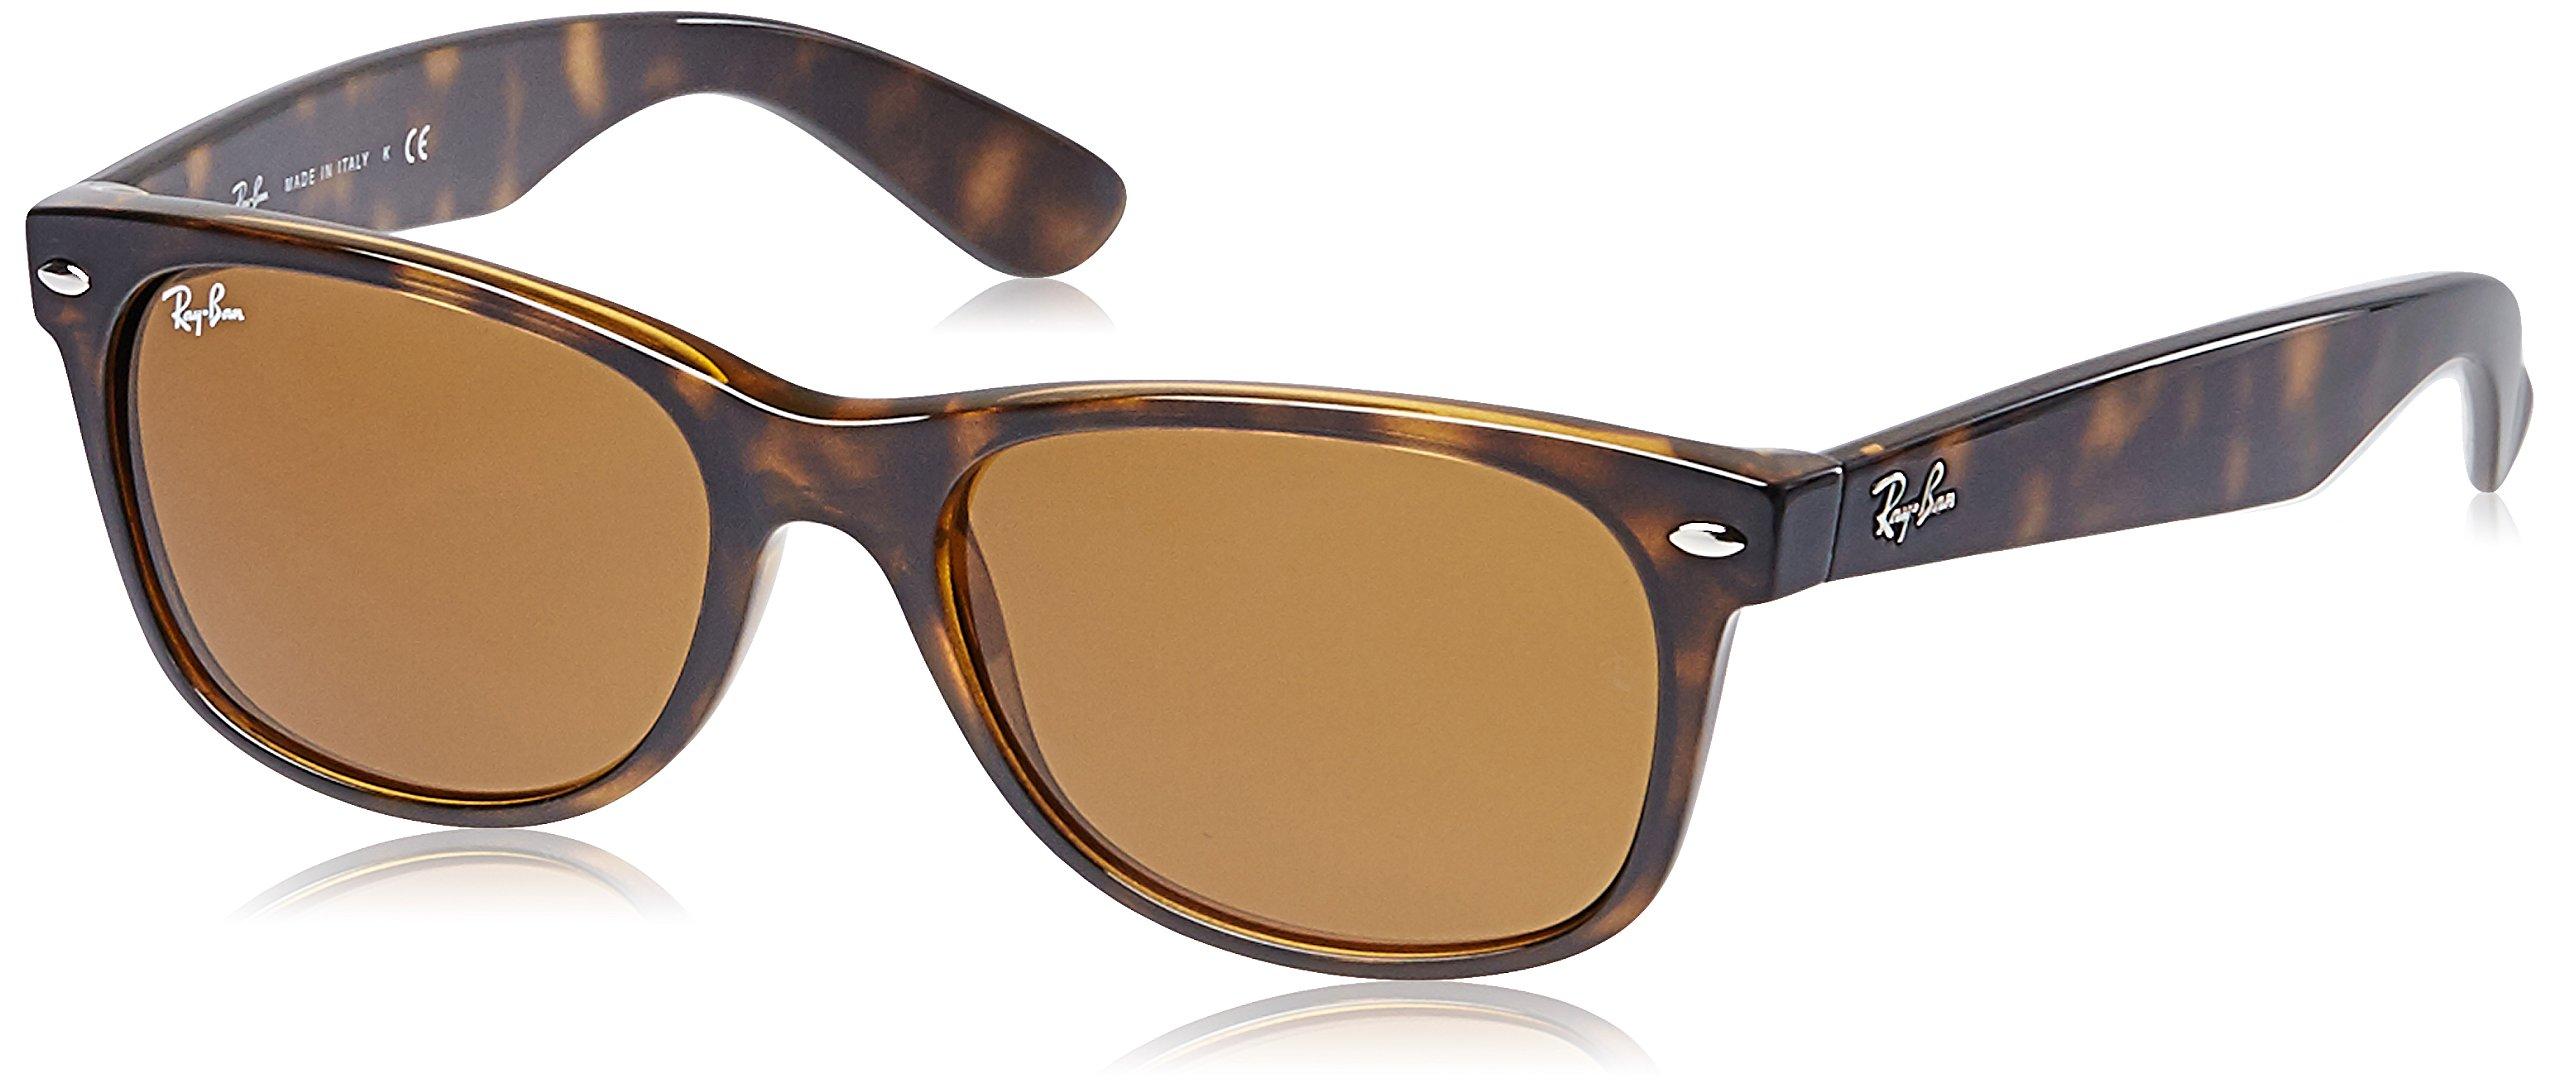 Ray-Ban, RB2132, New Wayfarer Sunglasses, Unisex Ray-Ban Sunglasses, 100% UV Protection, Polarized Wayfarer, Reduce Eye Strain, Lightweight Plastic Frame, Glass Lenses, 58 mm Frame by Ray-Ban (Image #1)